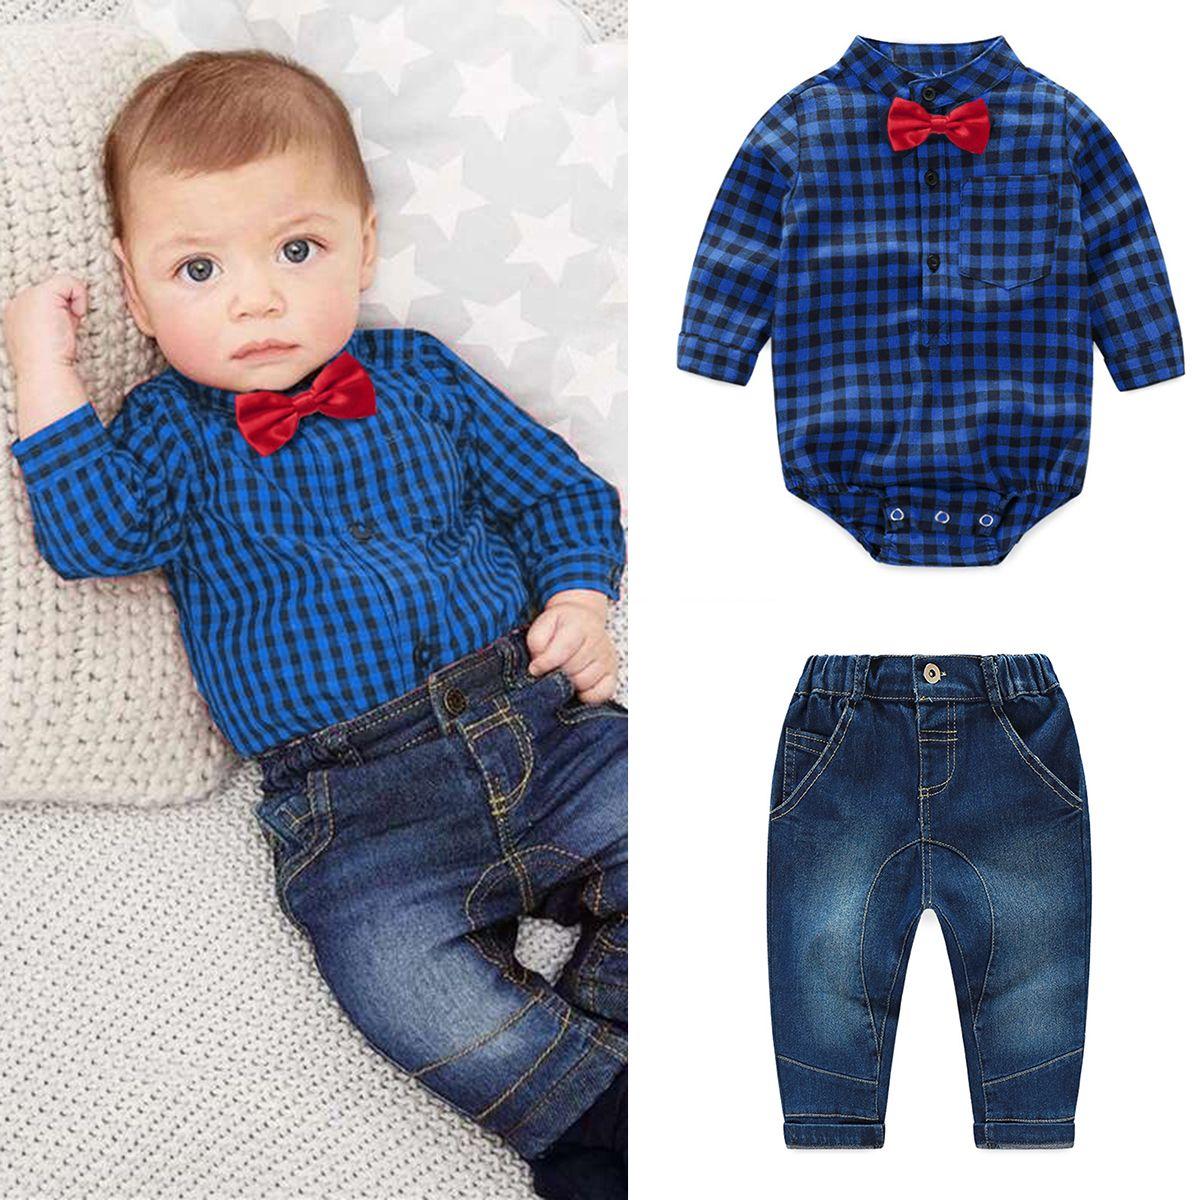 aec16fa43 Baby Boy Clothes Plaid Bow Tie Romper Jumpsuit+Jeans Pants Outfit ...